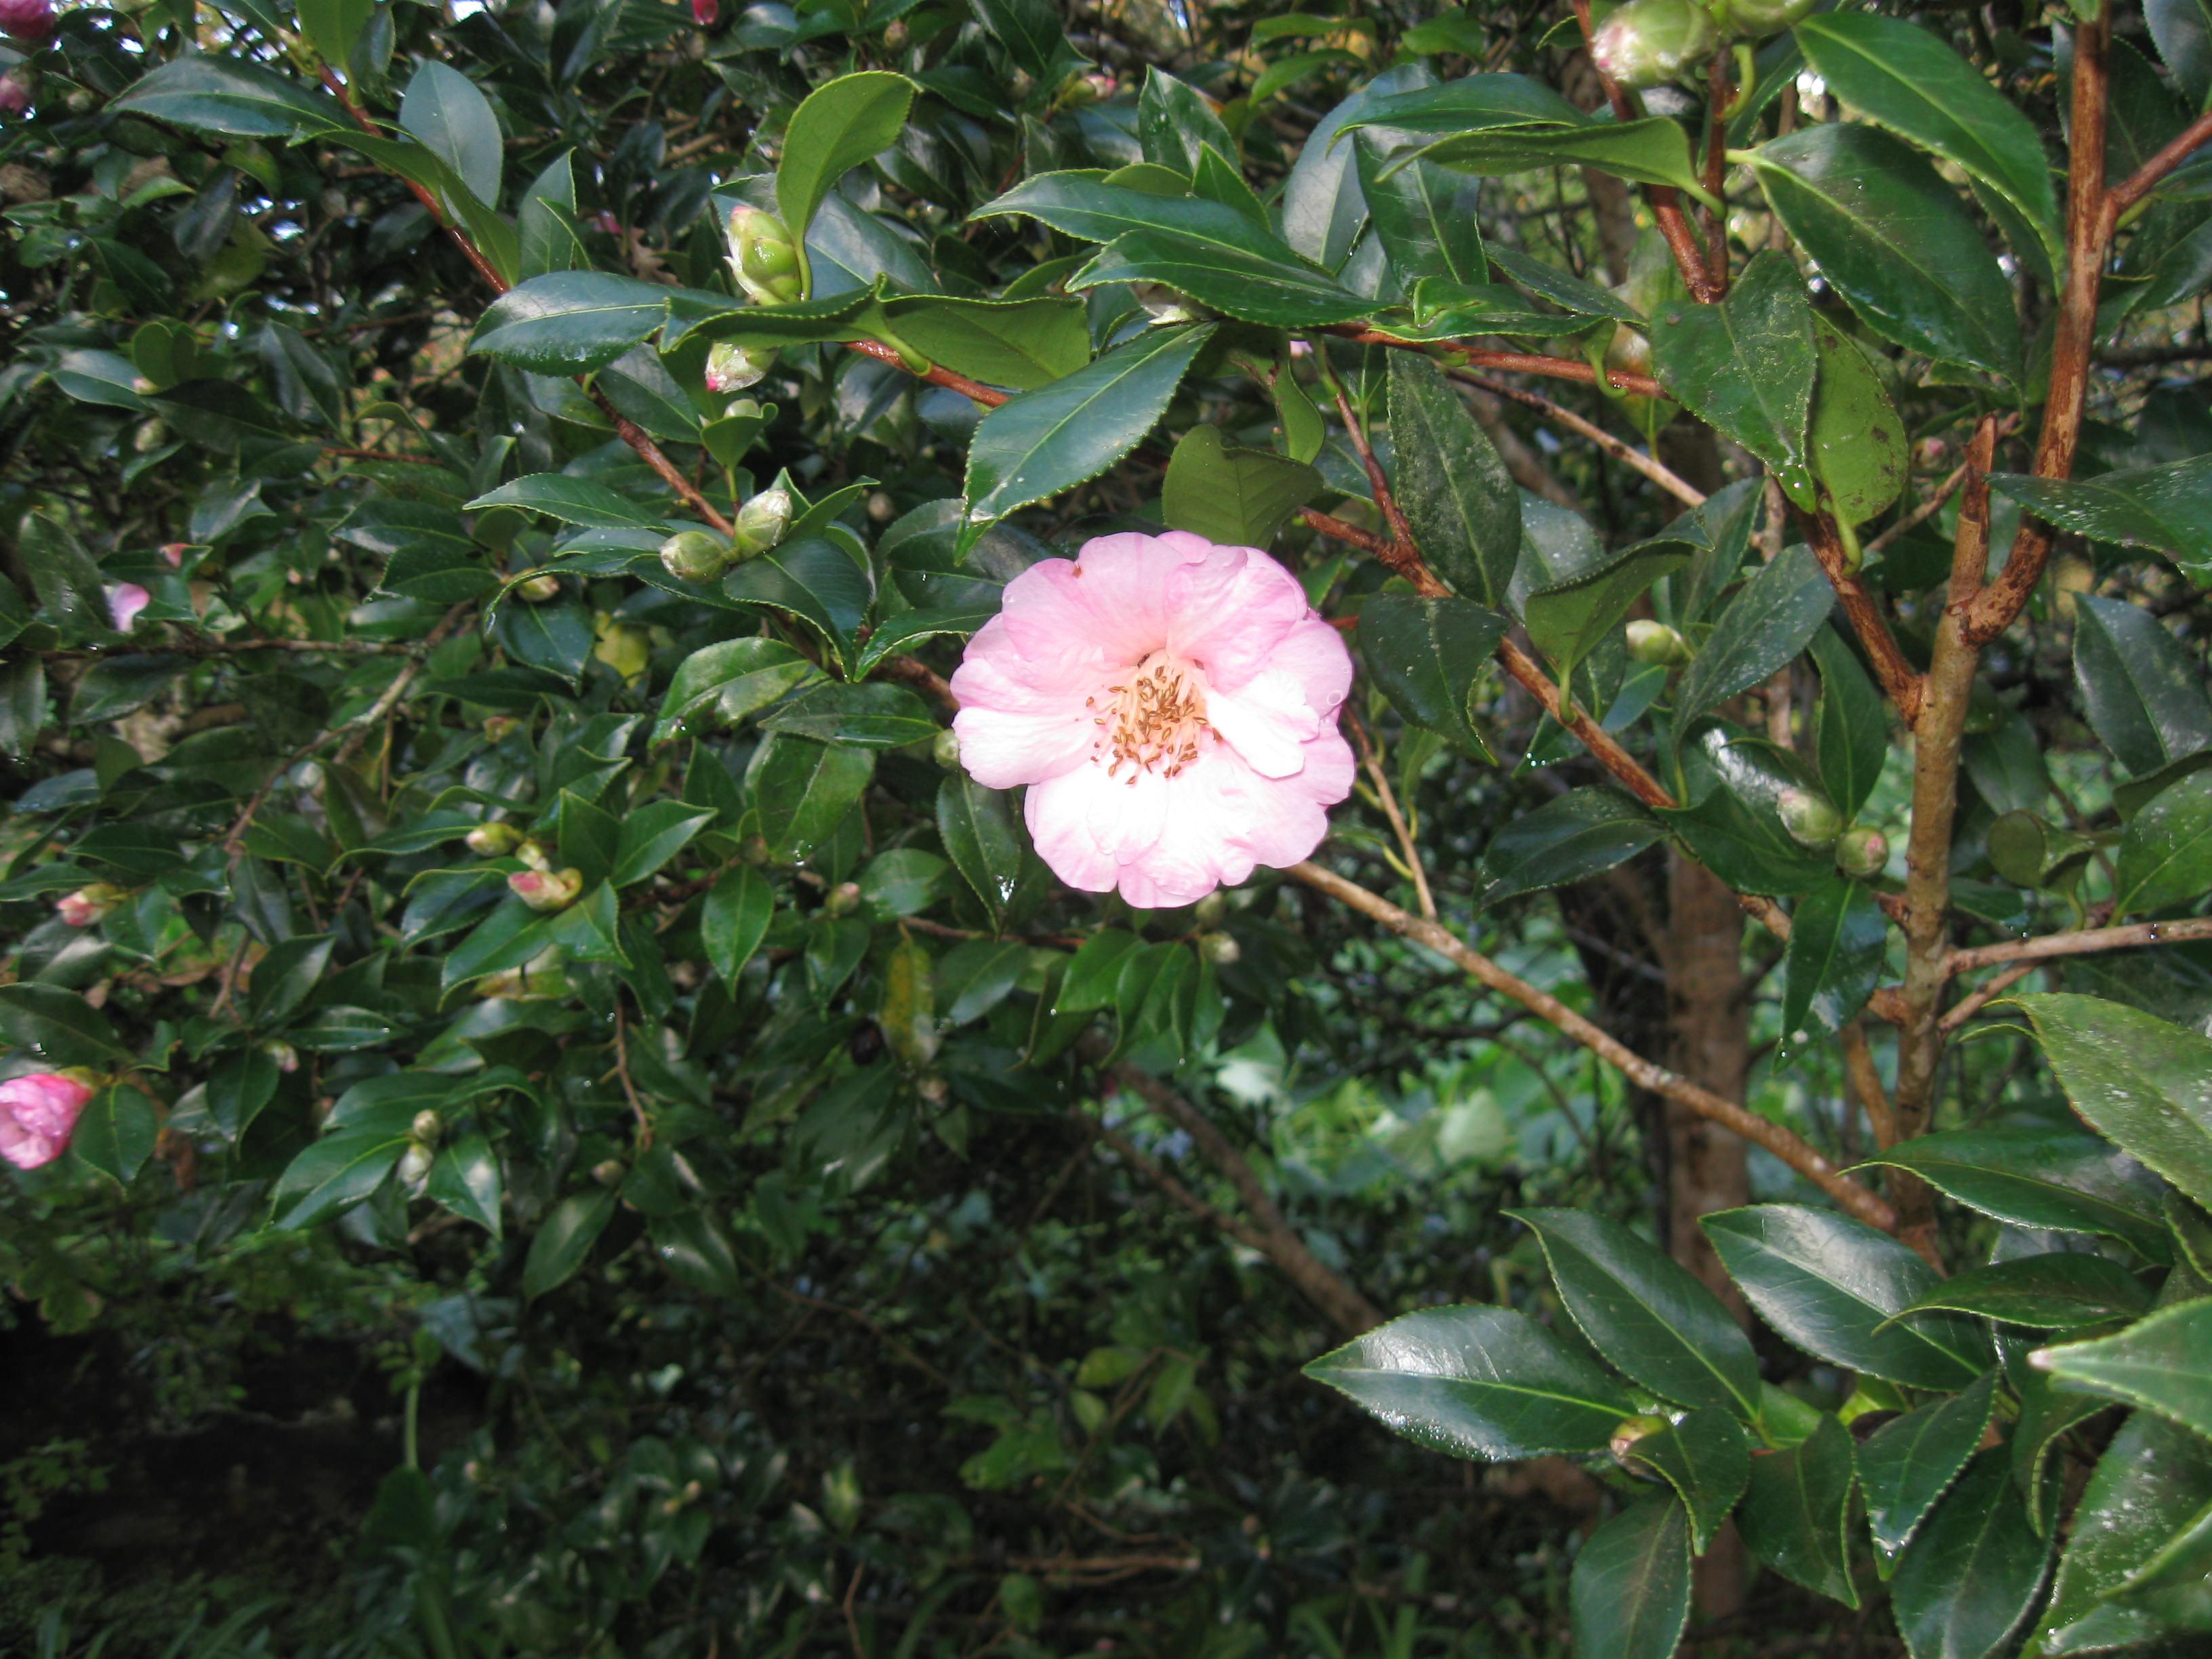 Camelia in bloom (in October) at Terra Nostra